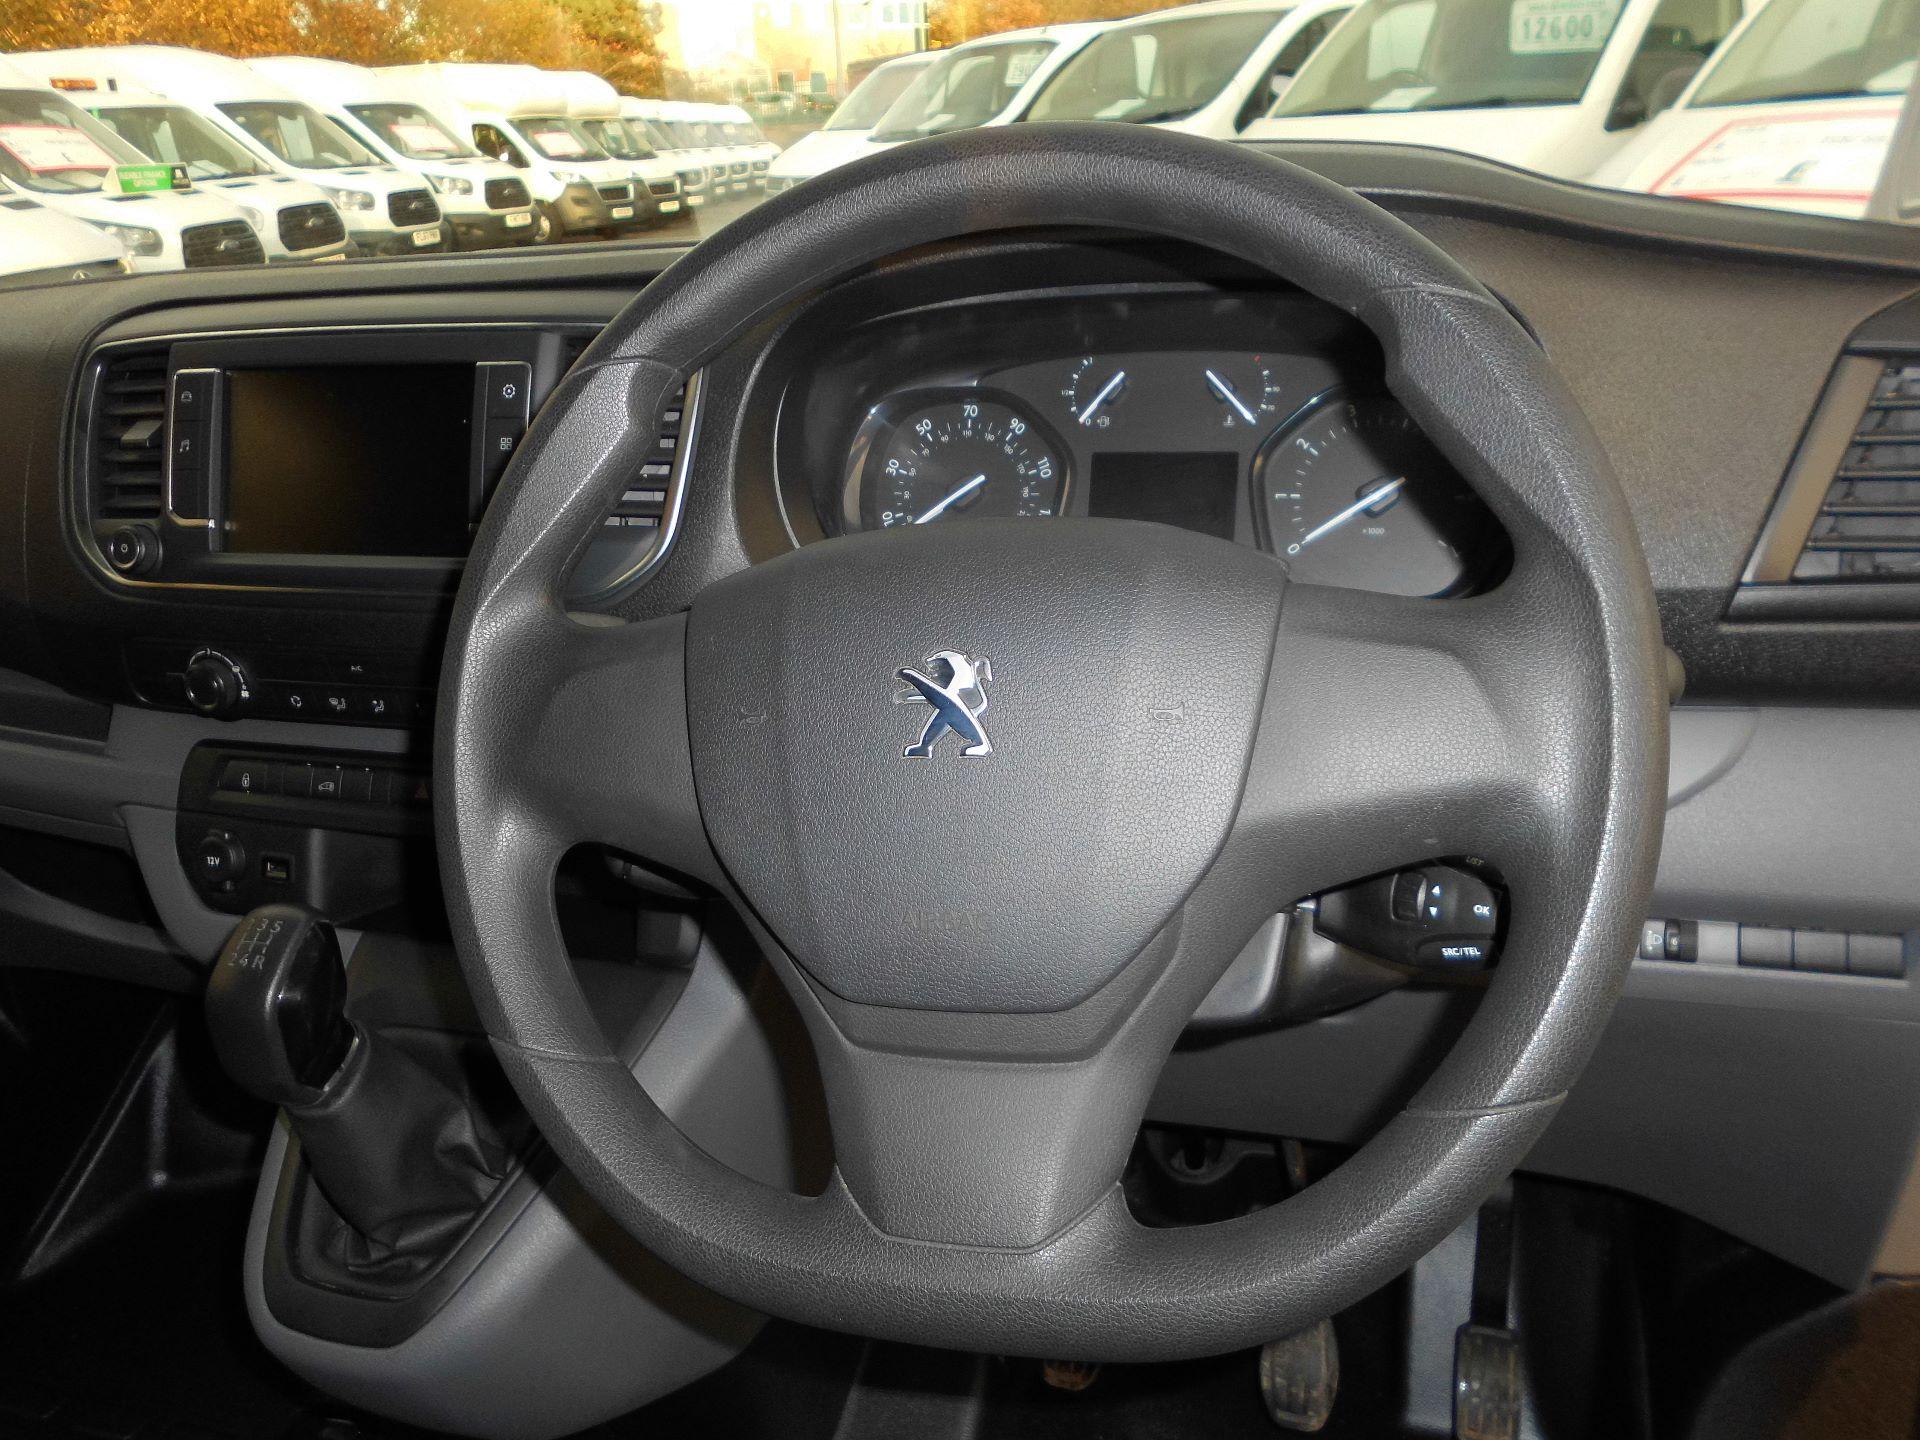 2018 Peugeot Expert STANDARD 1000 1.6 BLUEHDI 95 PROFESSIONAL EURO 6 (NU68GOH) Image 9